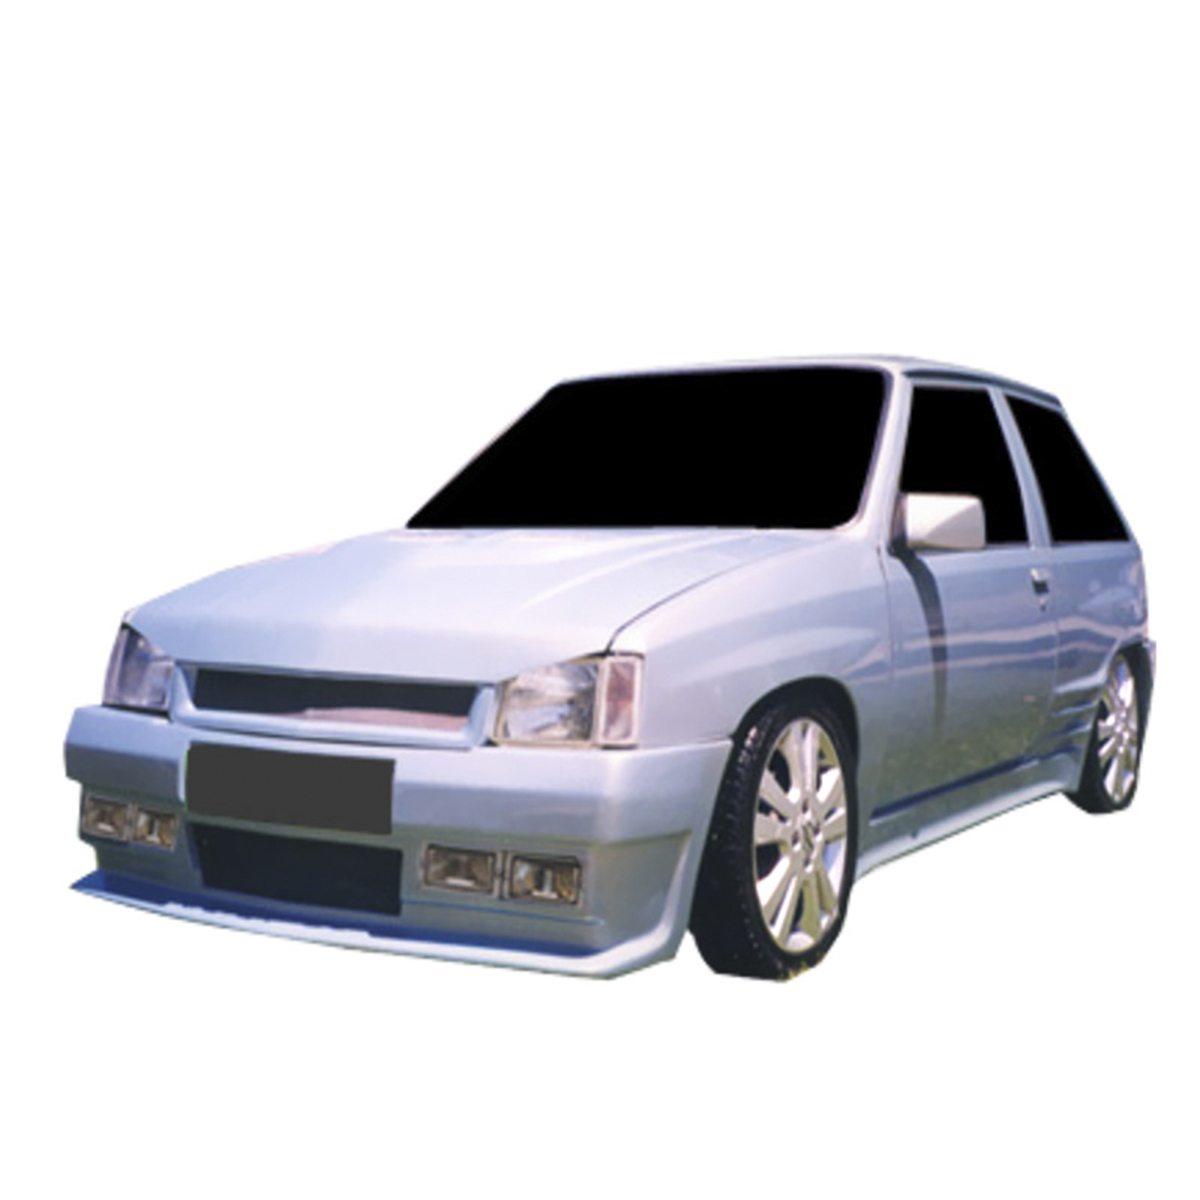 Opel-Corsa-A-GT-Frt-PCC019